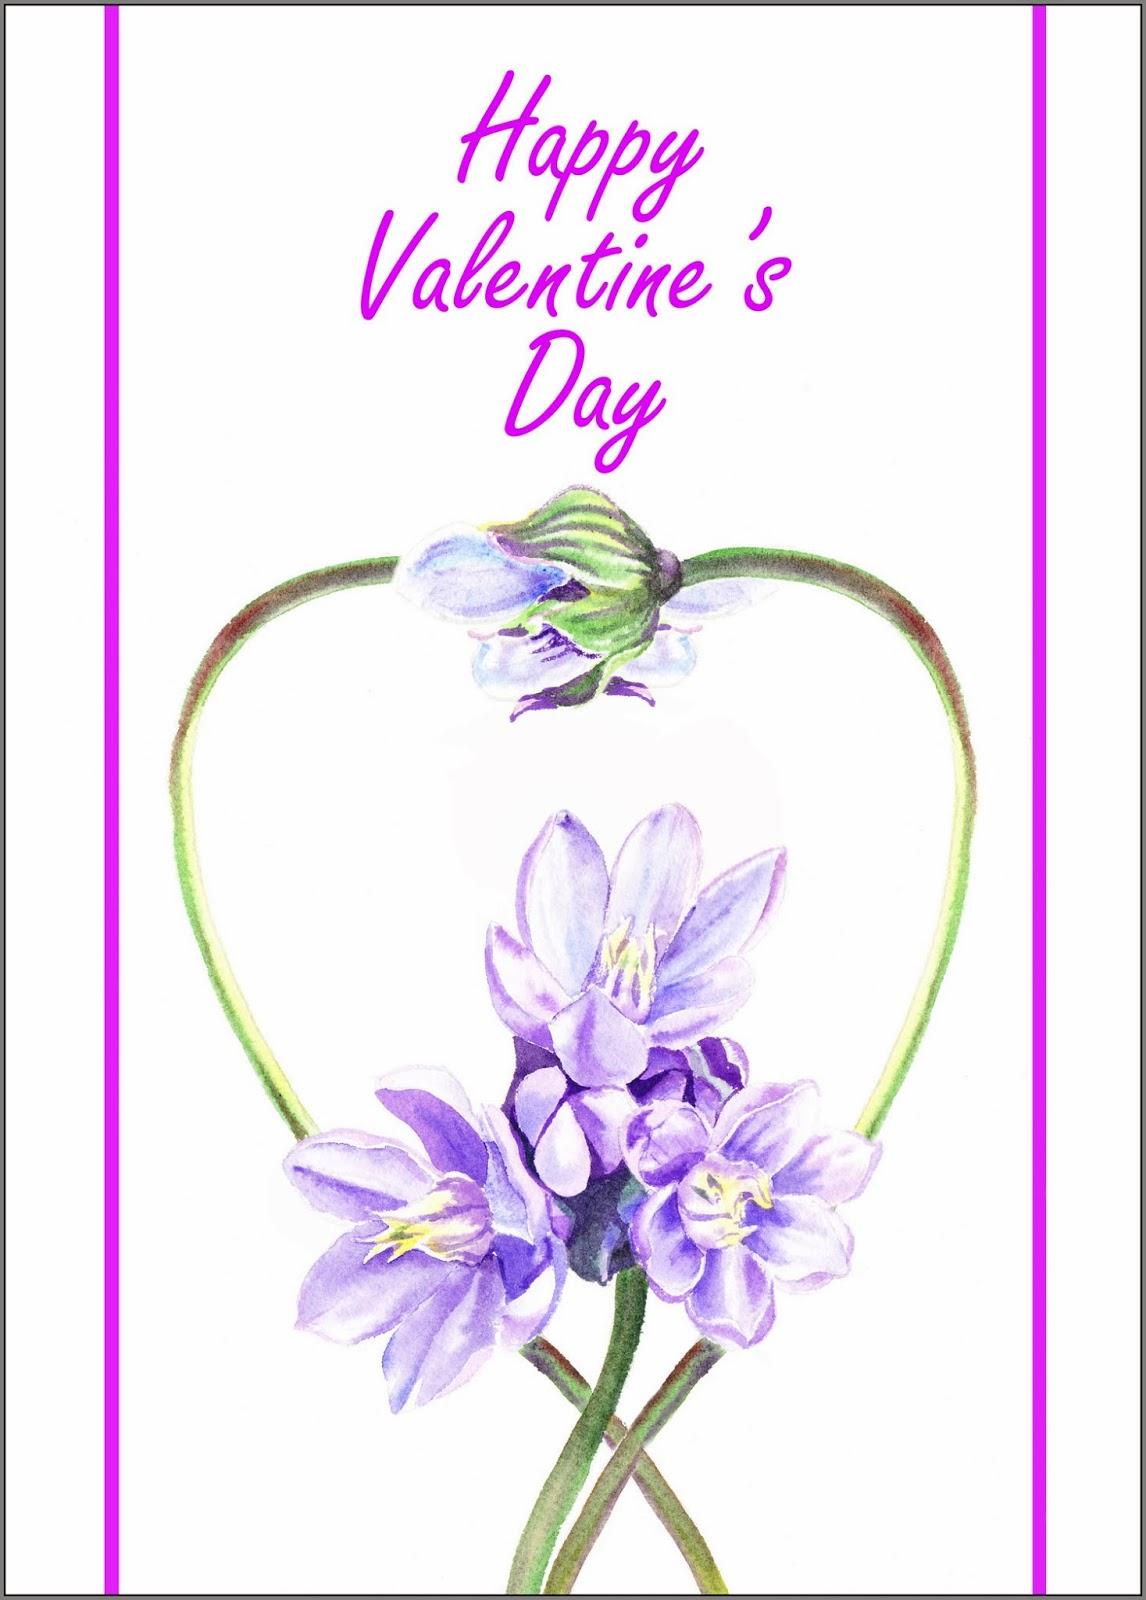 purple flowers forming heart